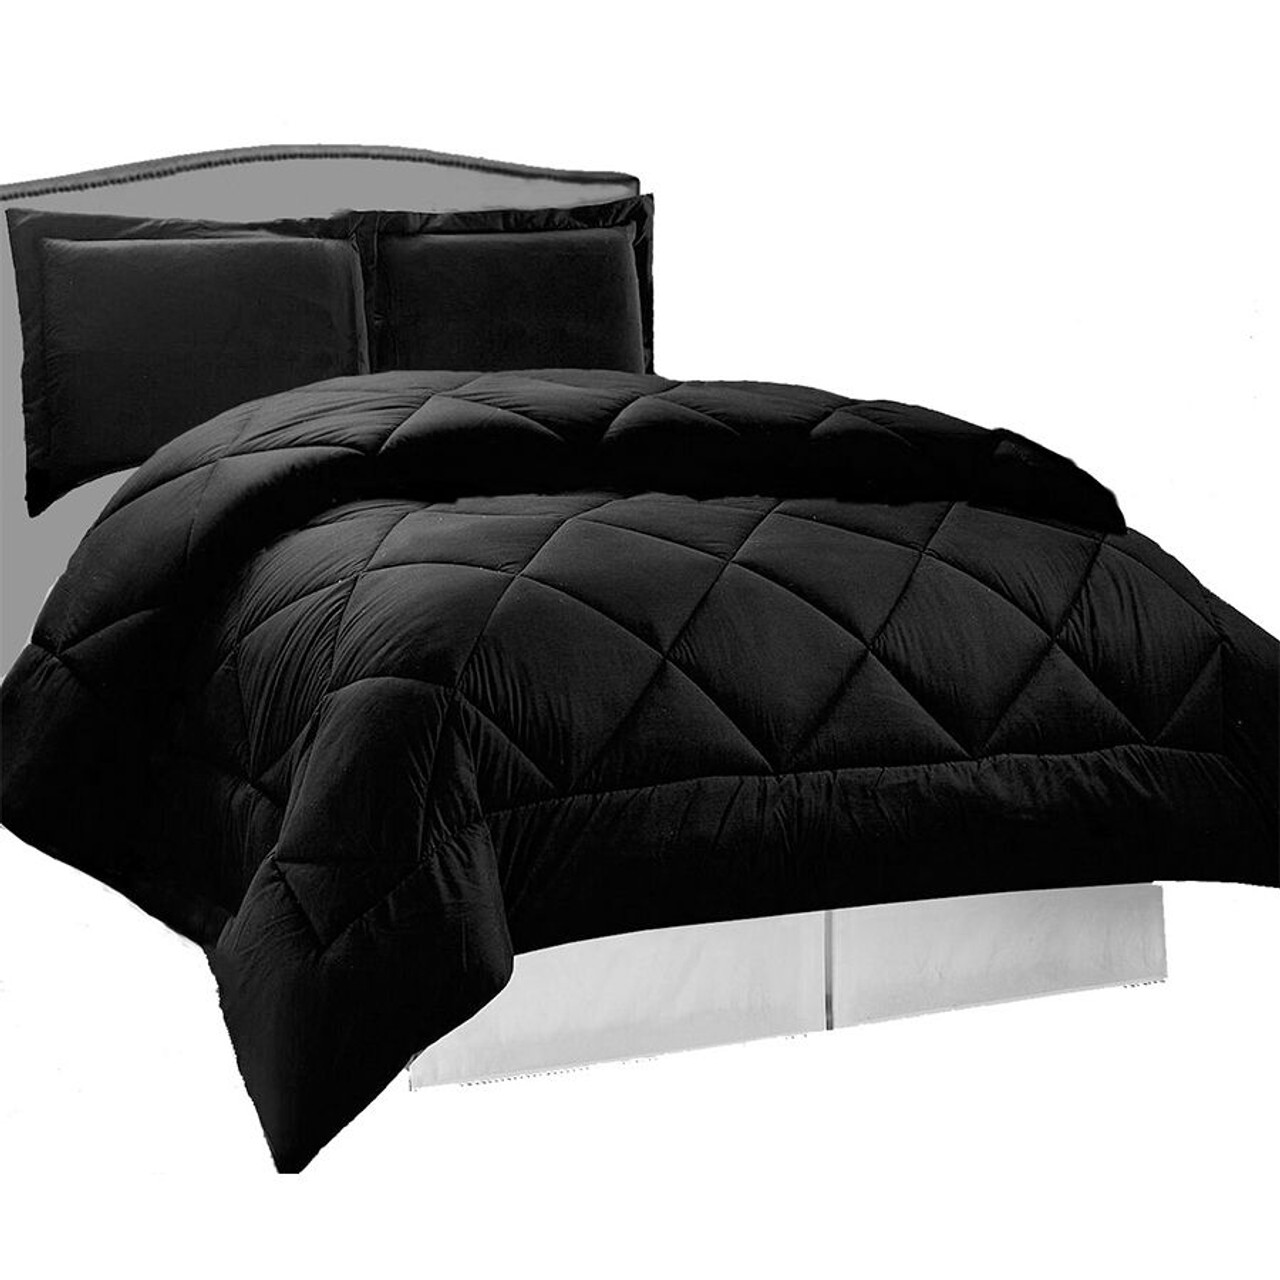 3 pcs Down Alternative Reversible Comforter Set in Black Color